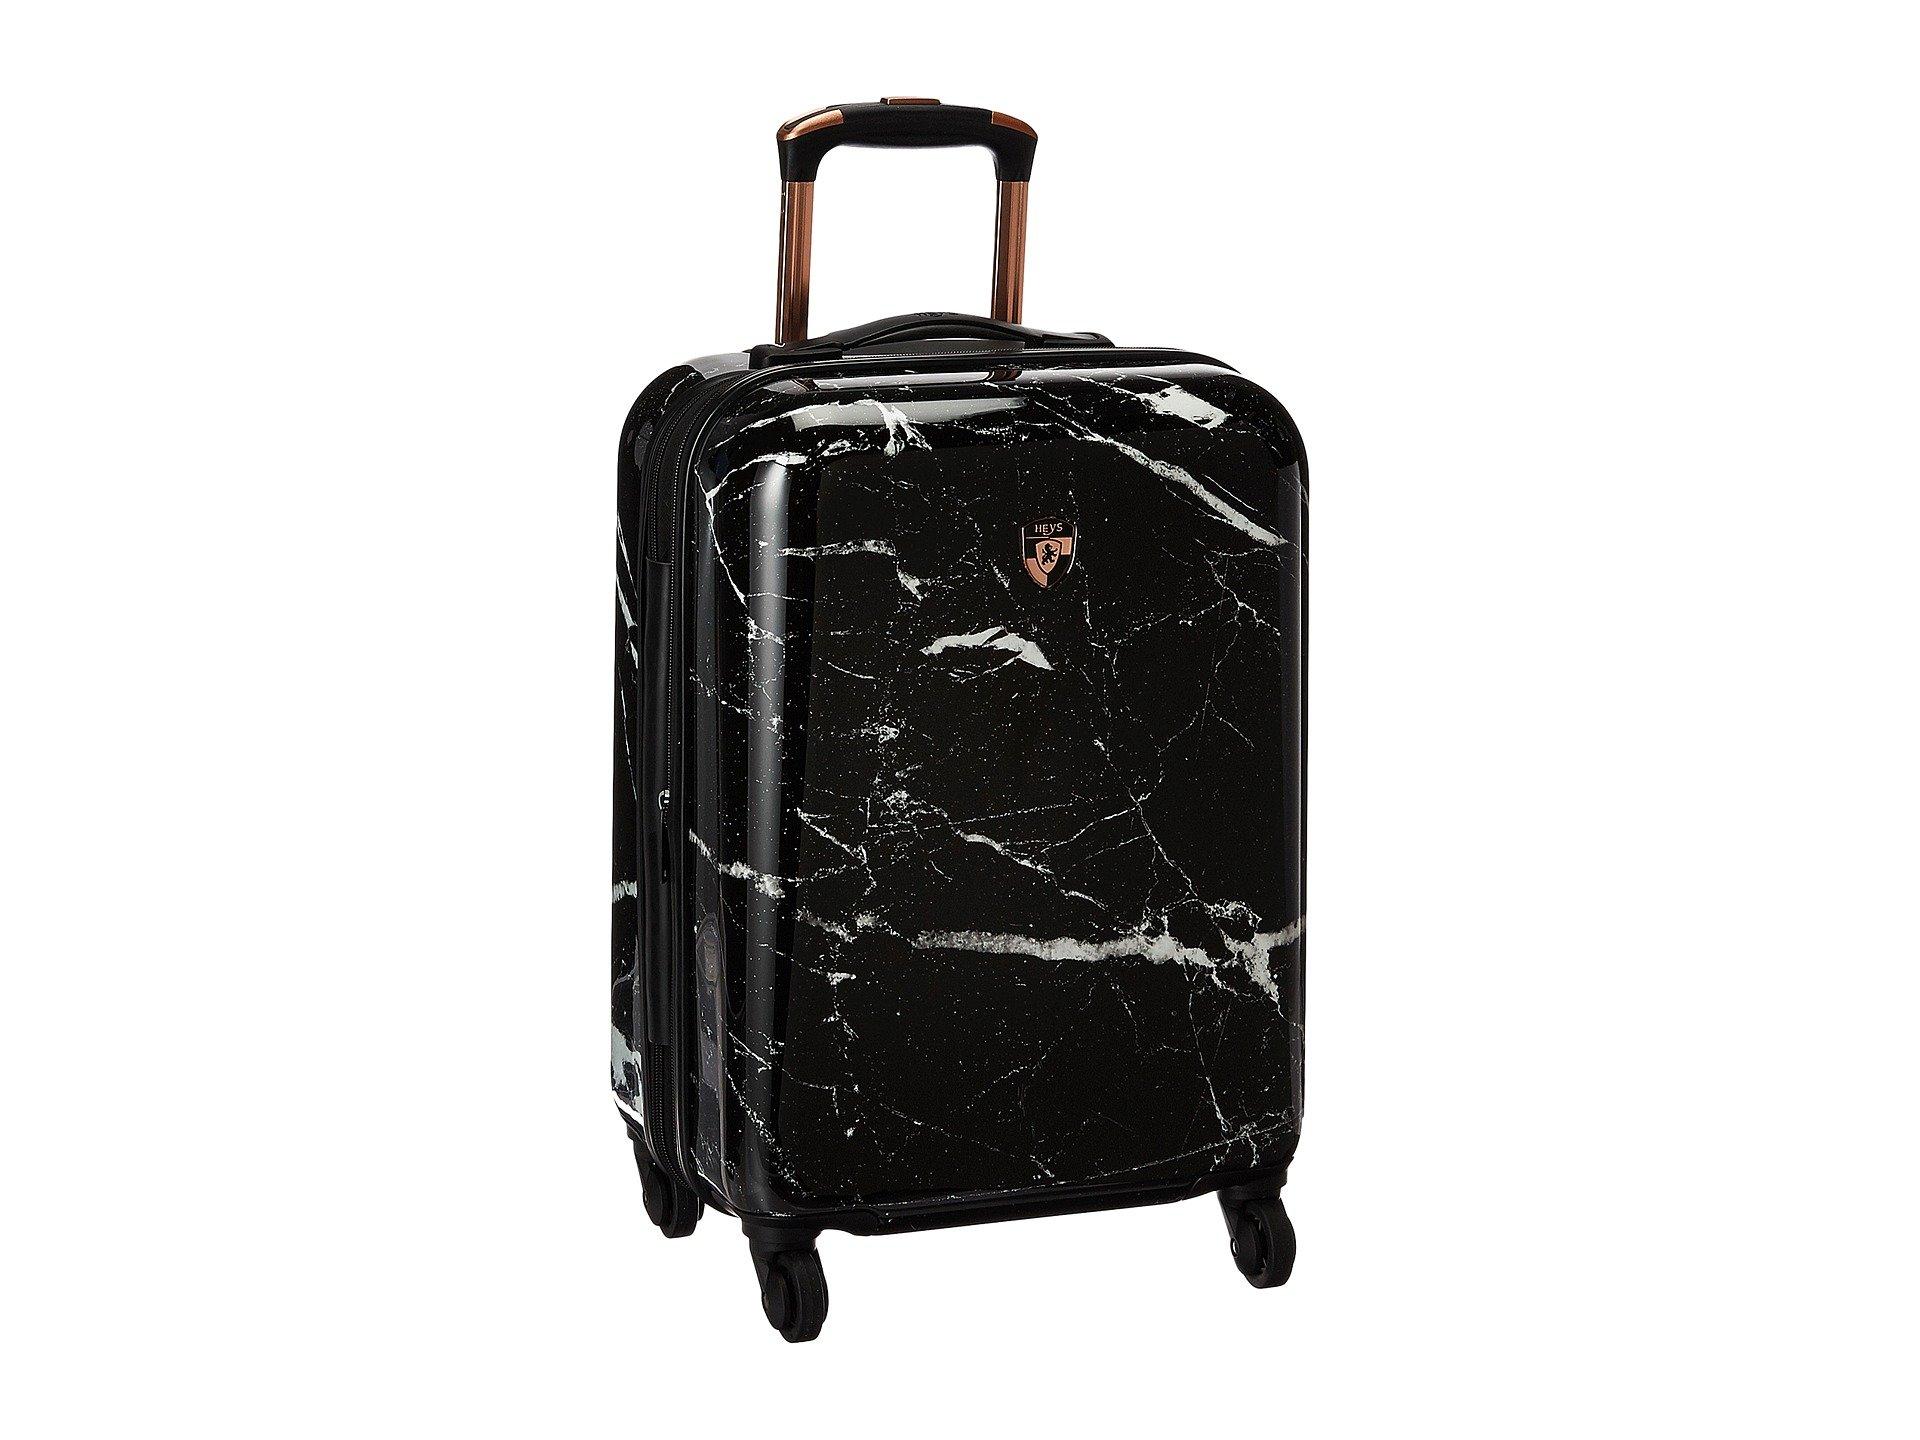 Heys America Unisex Marquina 21'' Spinner Black Luggage by HEYS AMERICA